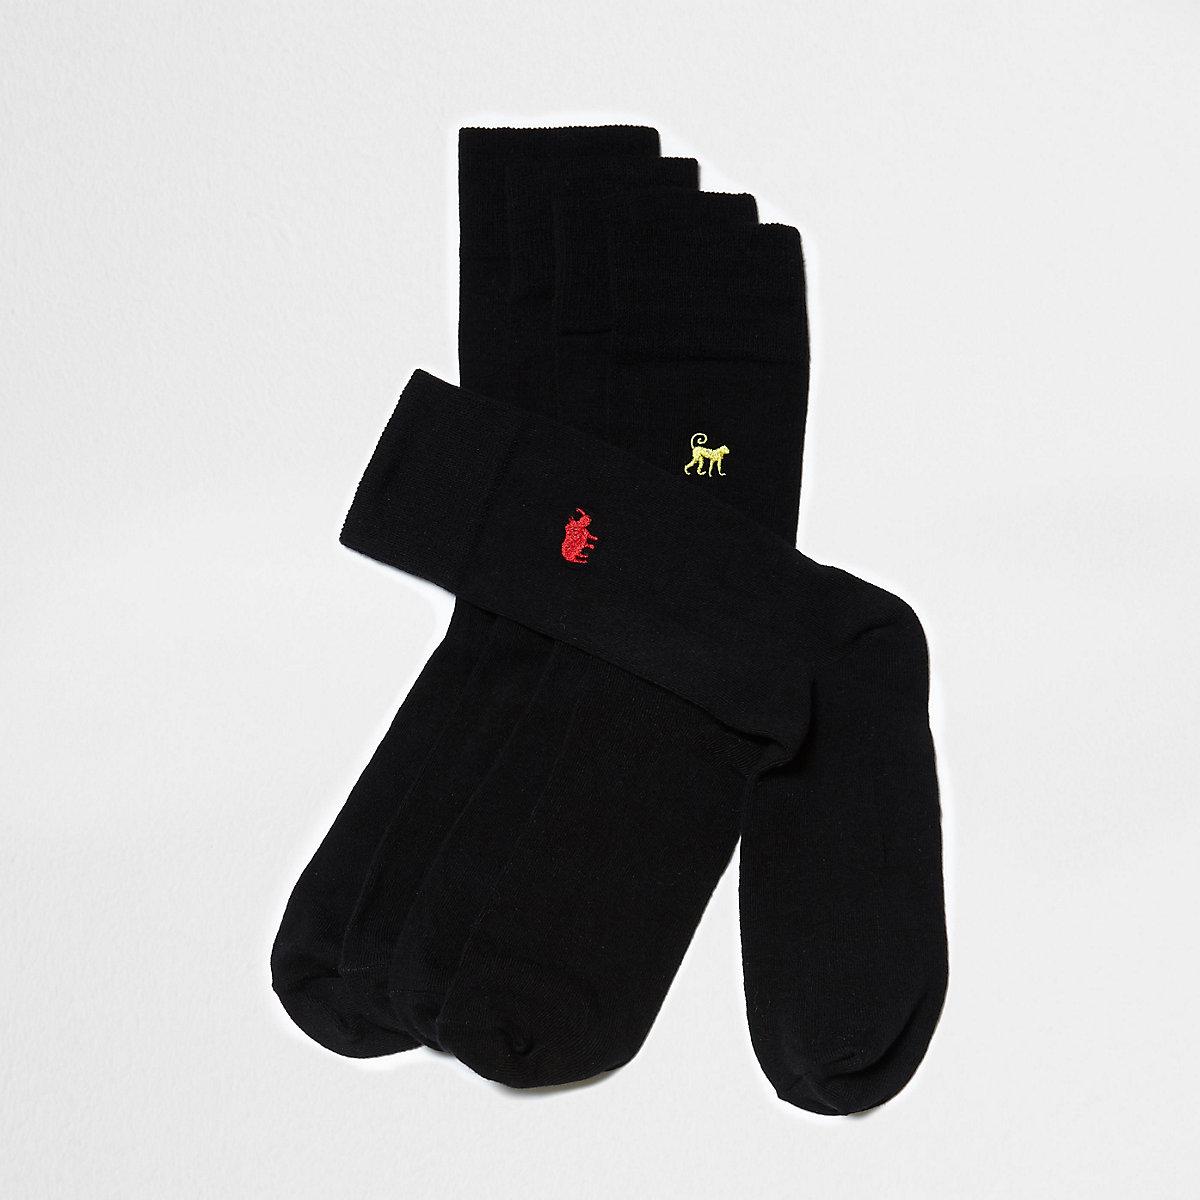 Big and Tall black animal socks 5 pack